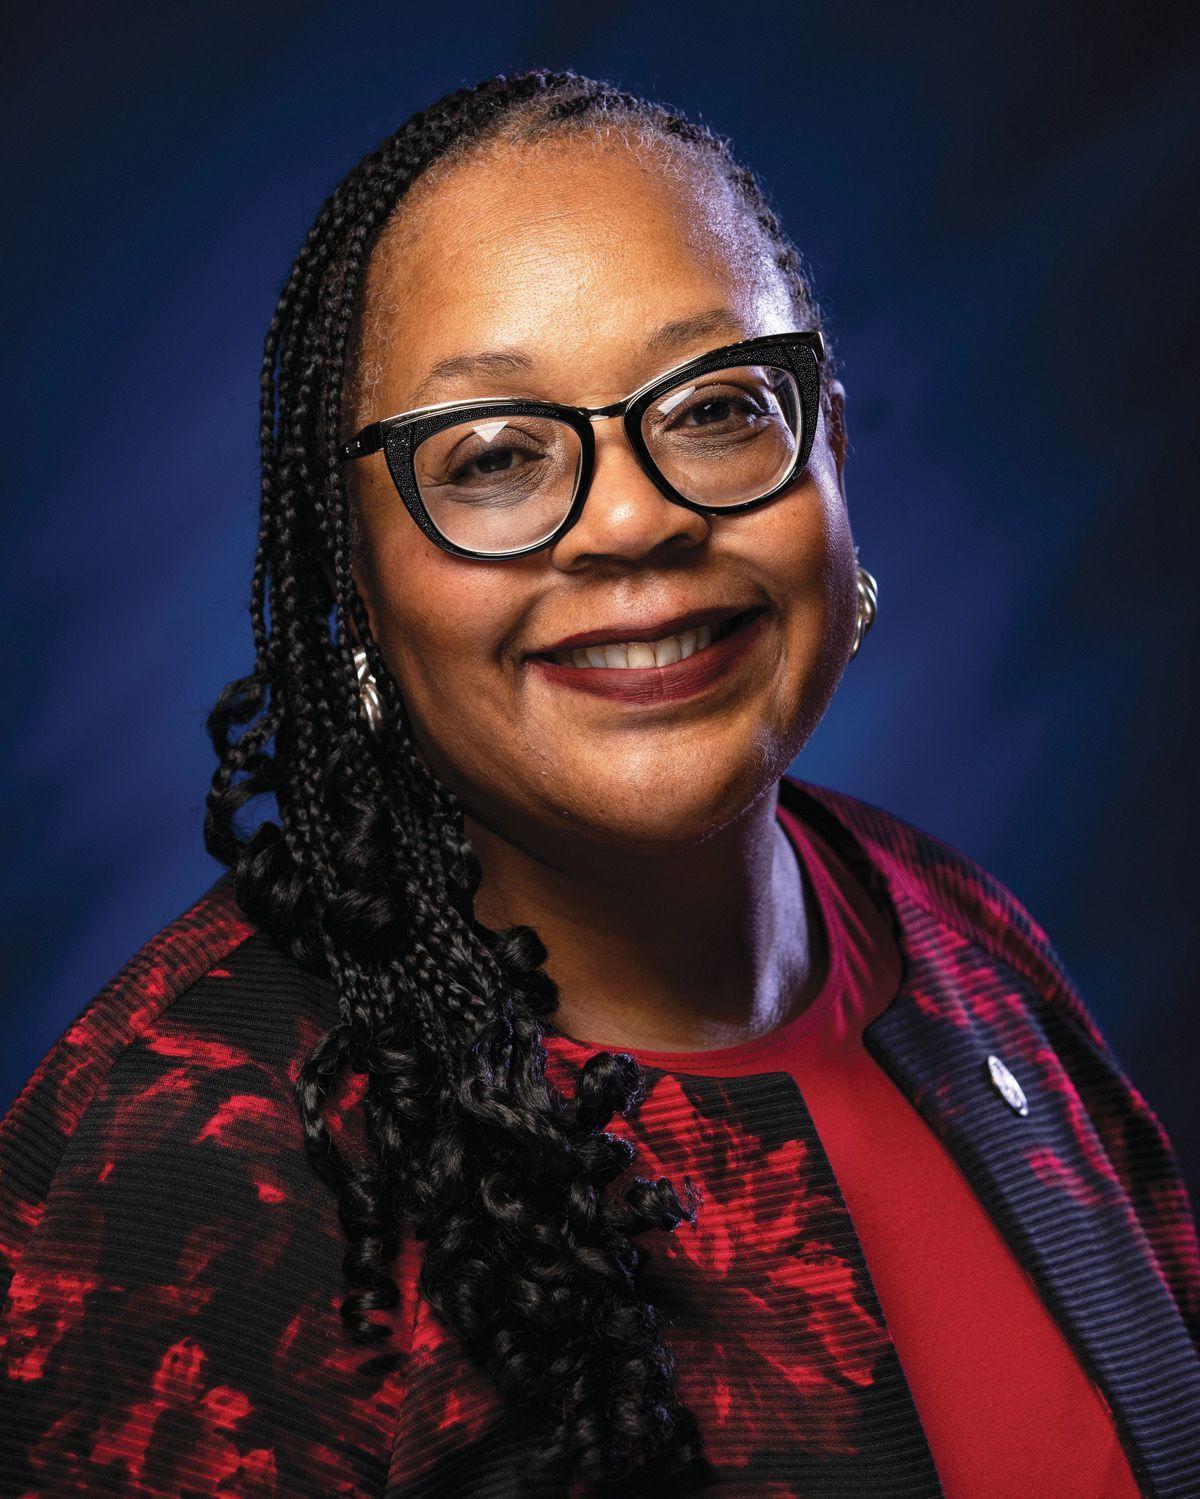 State Rep. Carolyn Jackson, D-Hammond